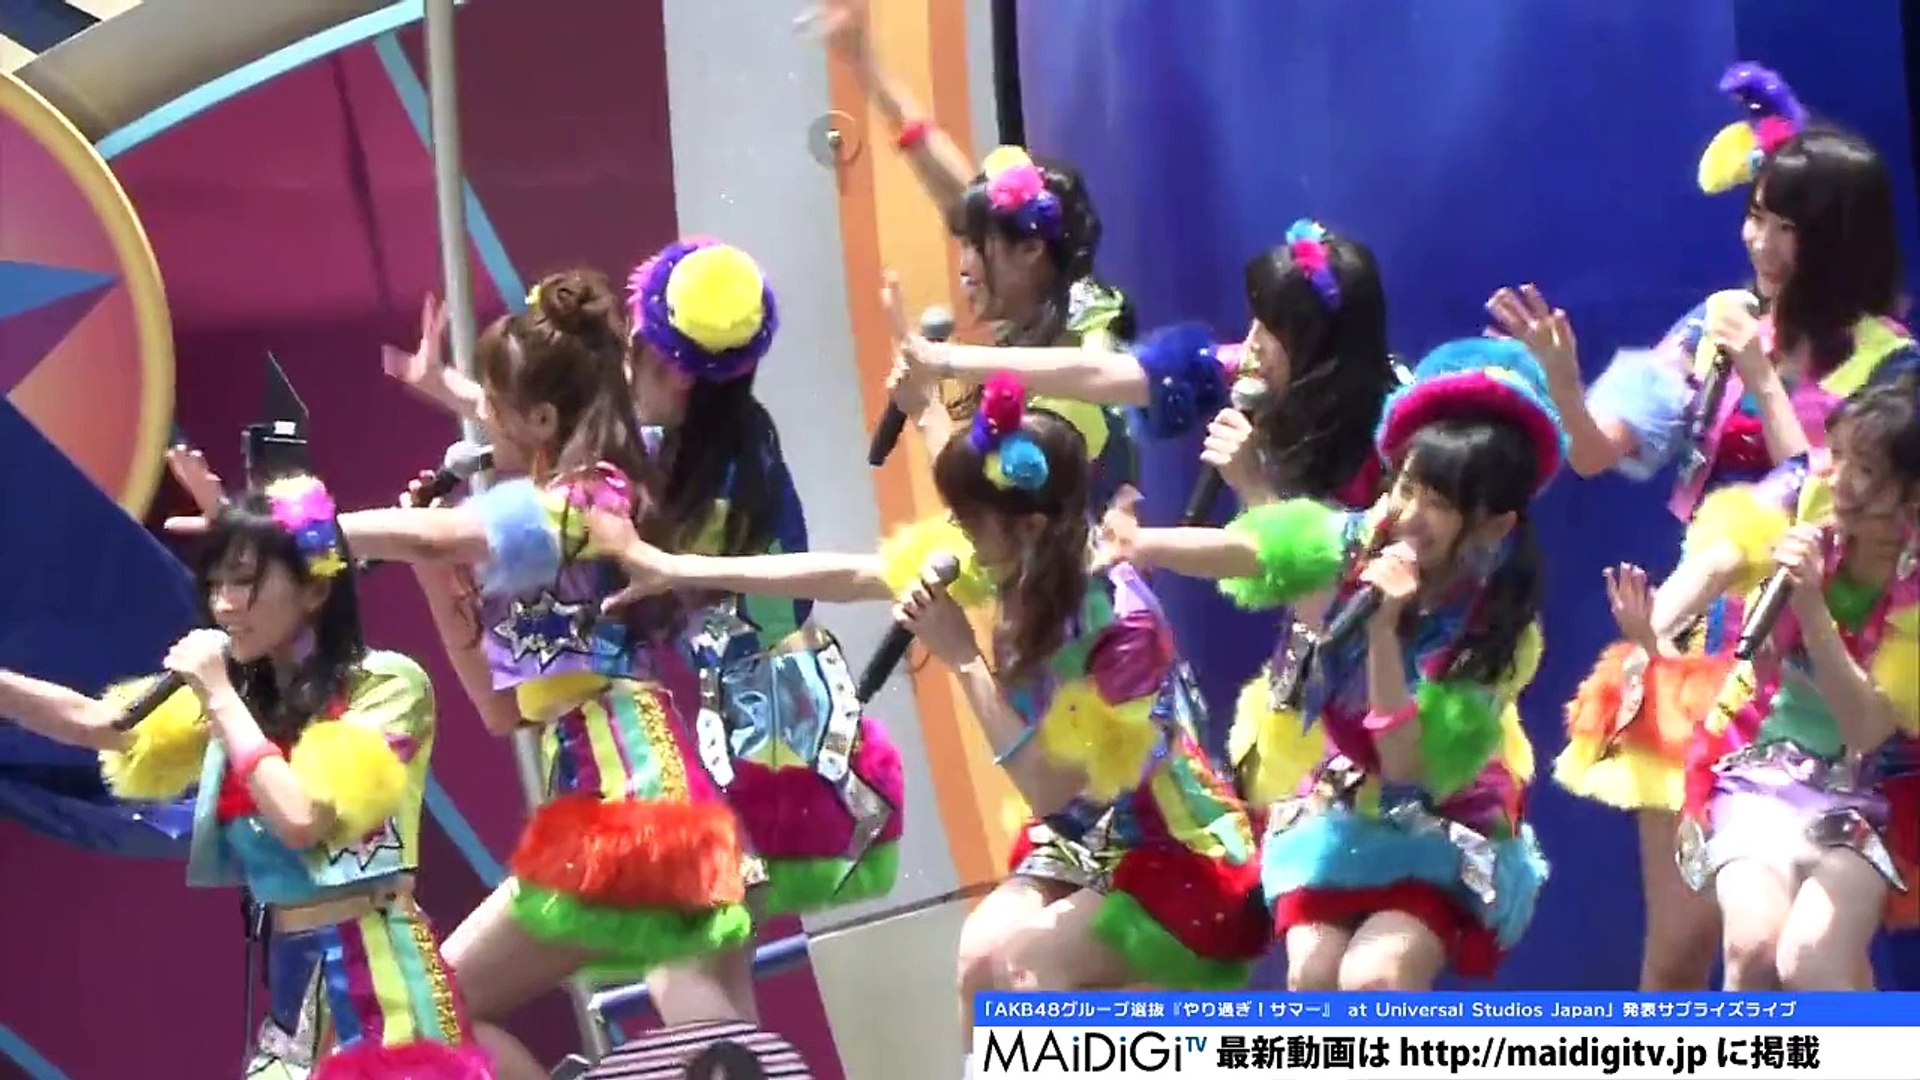 [ MAiDiGi TV] AKB48 Group Senbatsu at Universal Studios Japan